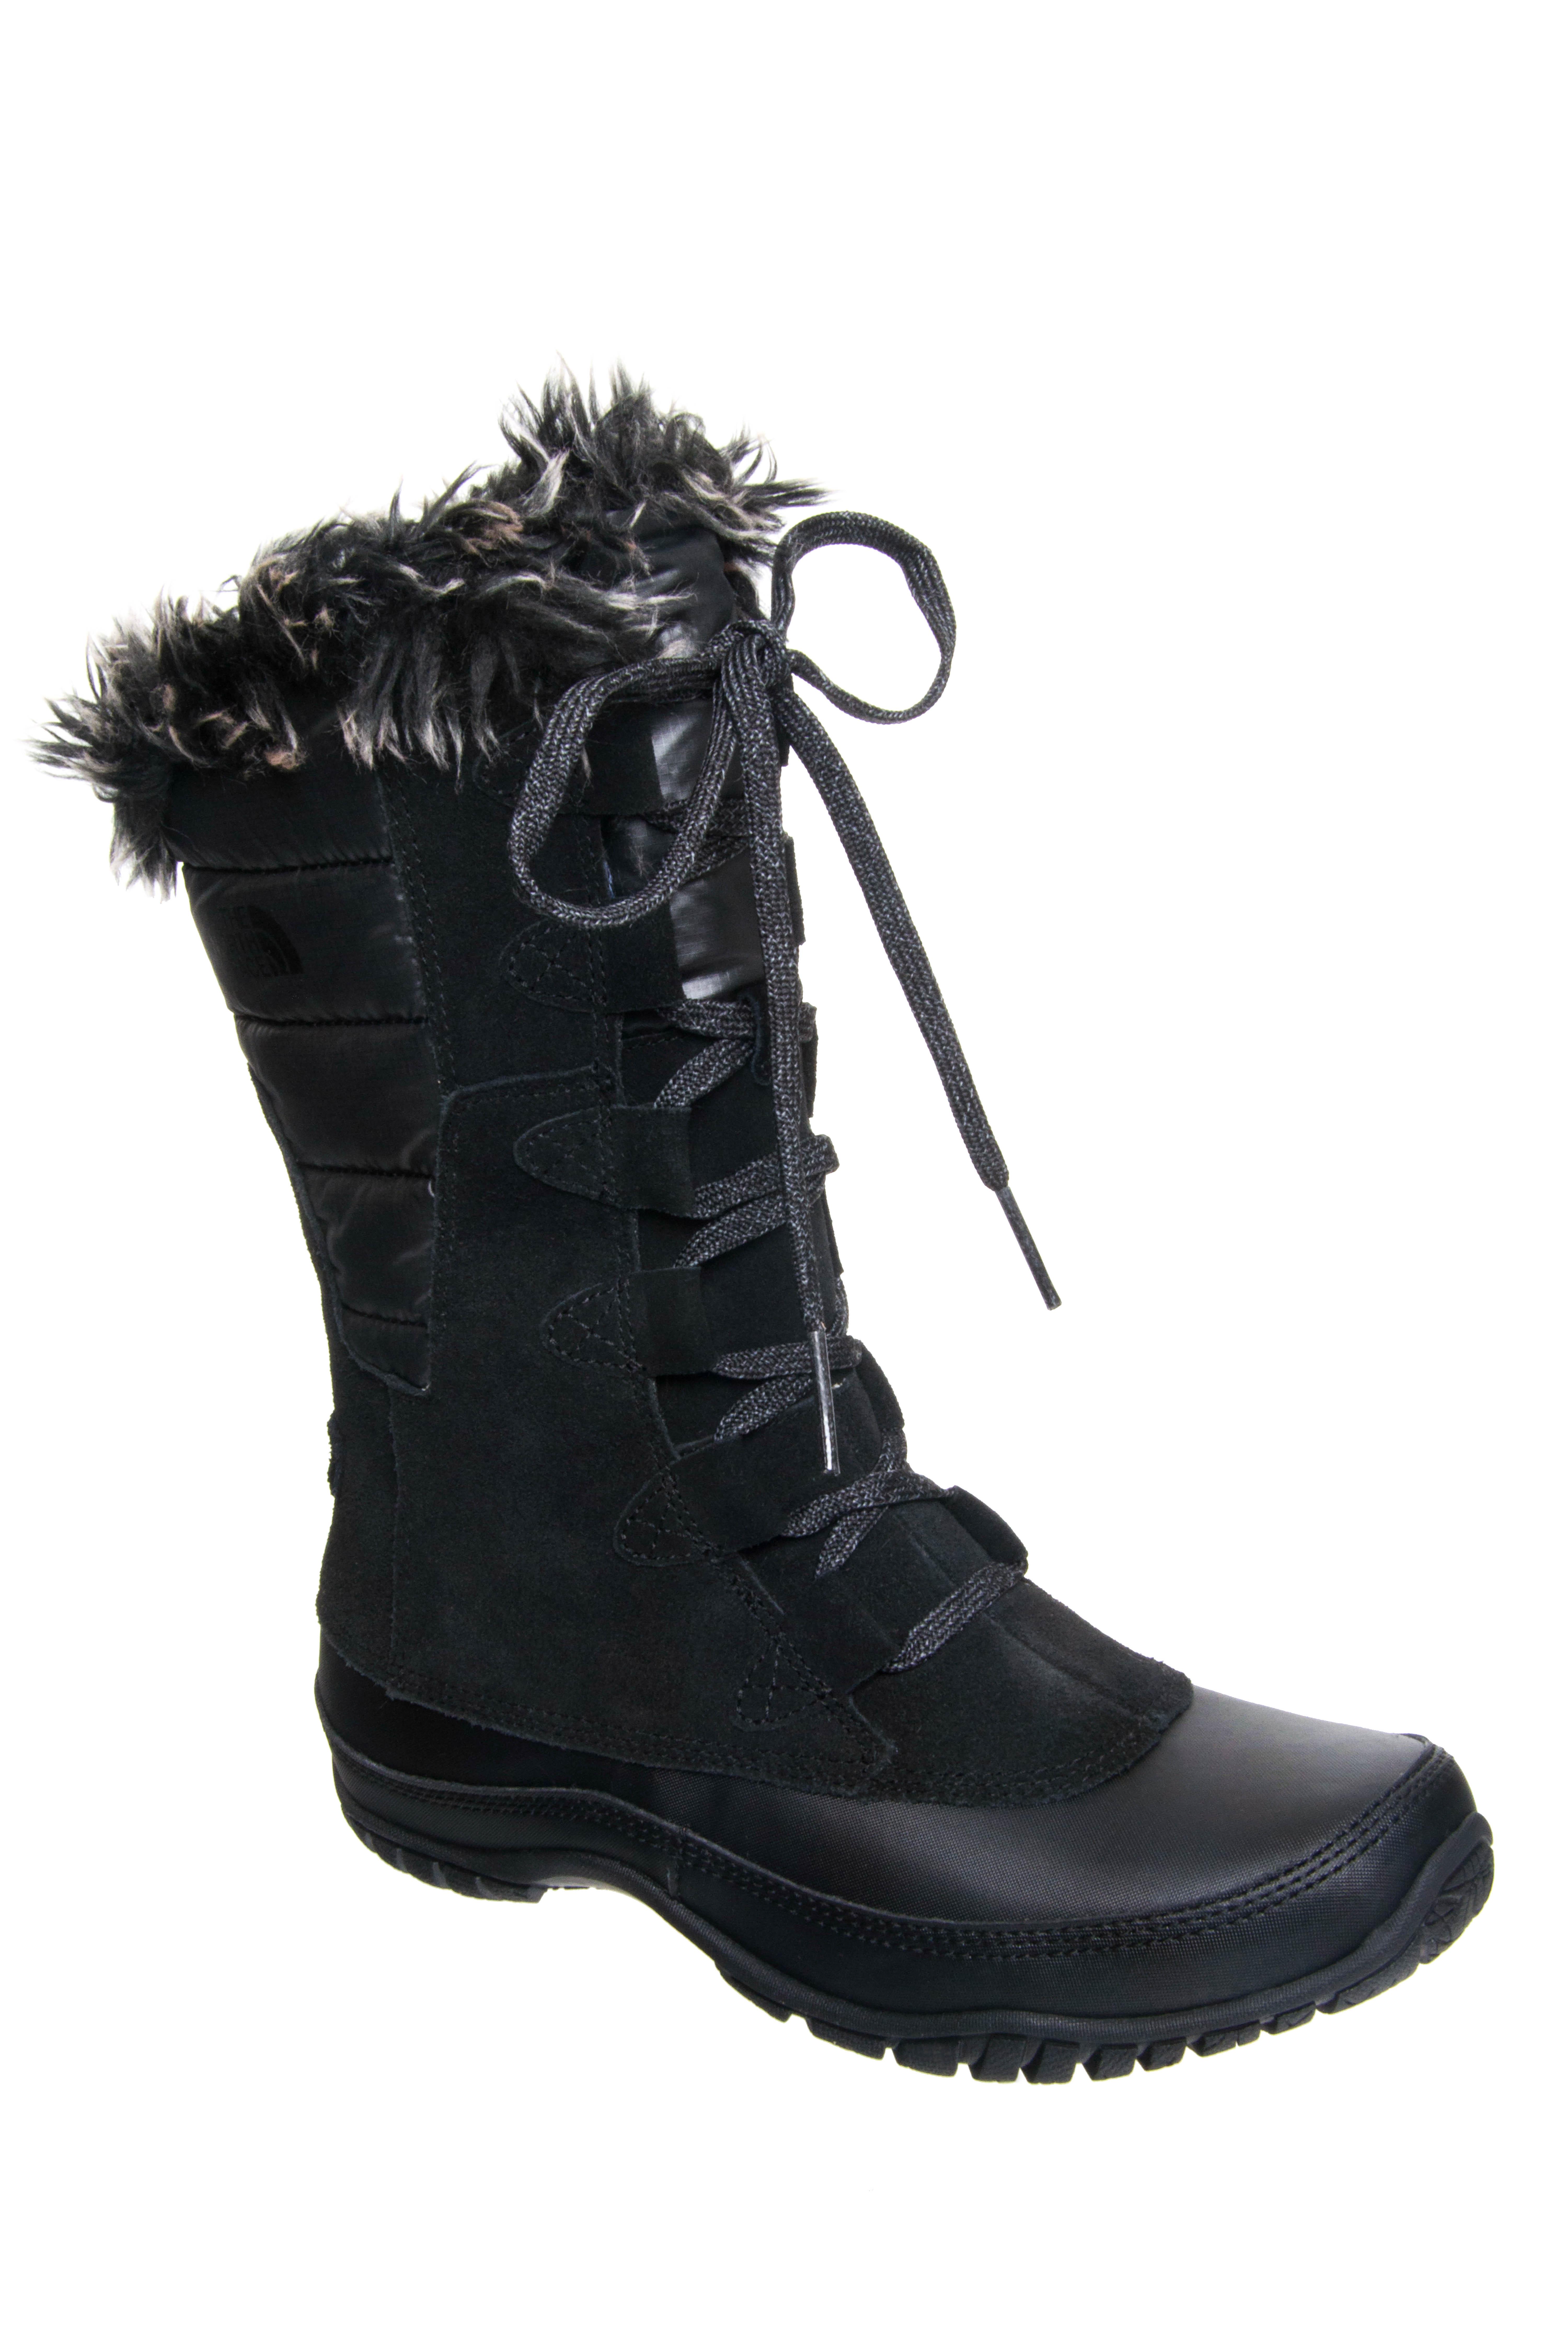 The North Face Nuptse Purna Boots - Black